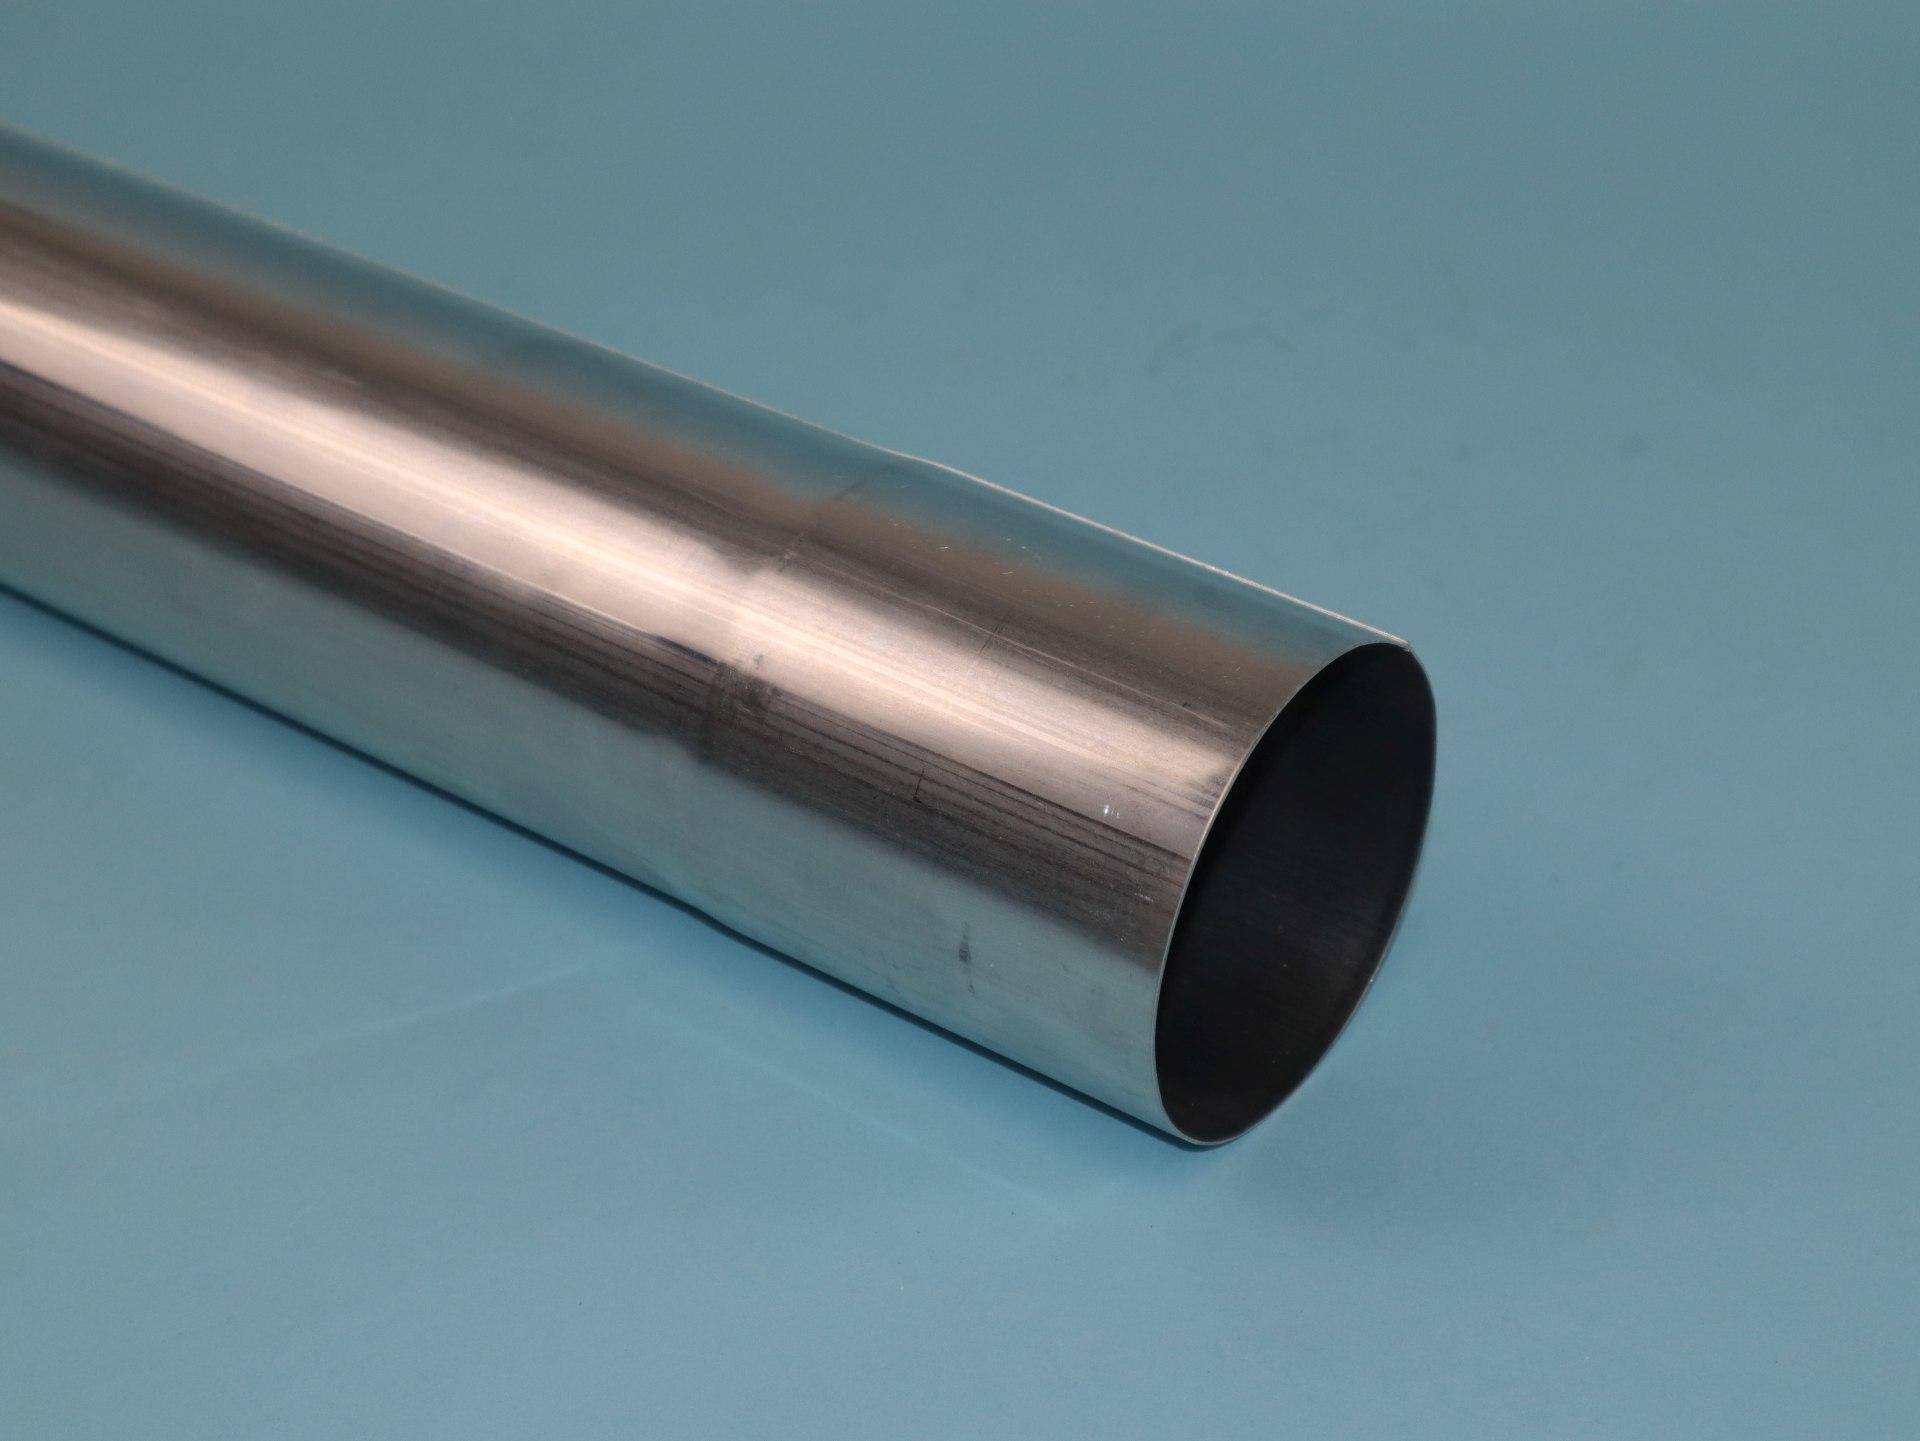 Fallrohr Aluminium mit einseitiger Muffe, 2m lang